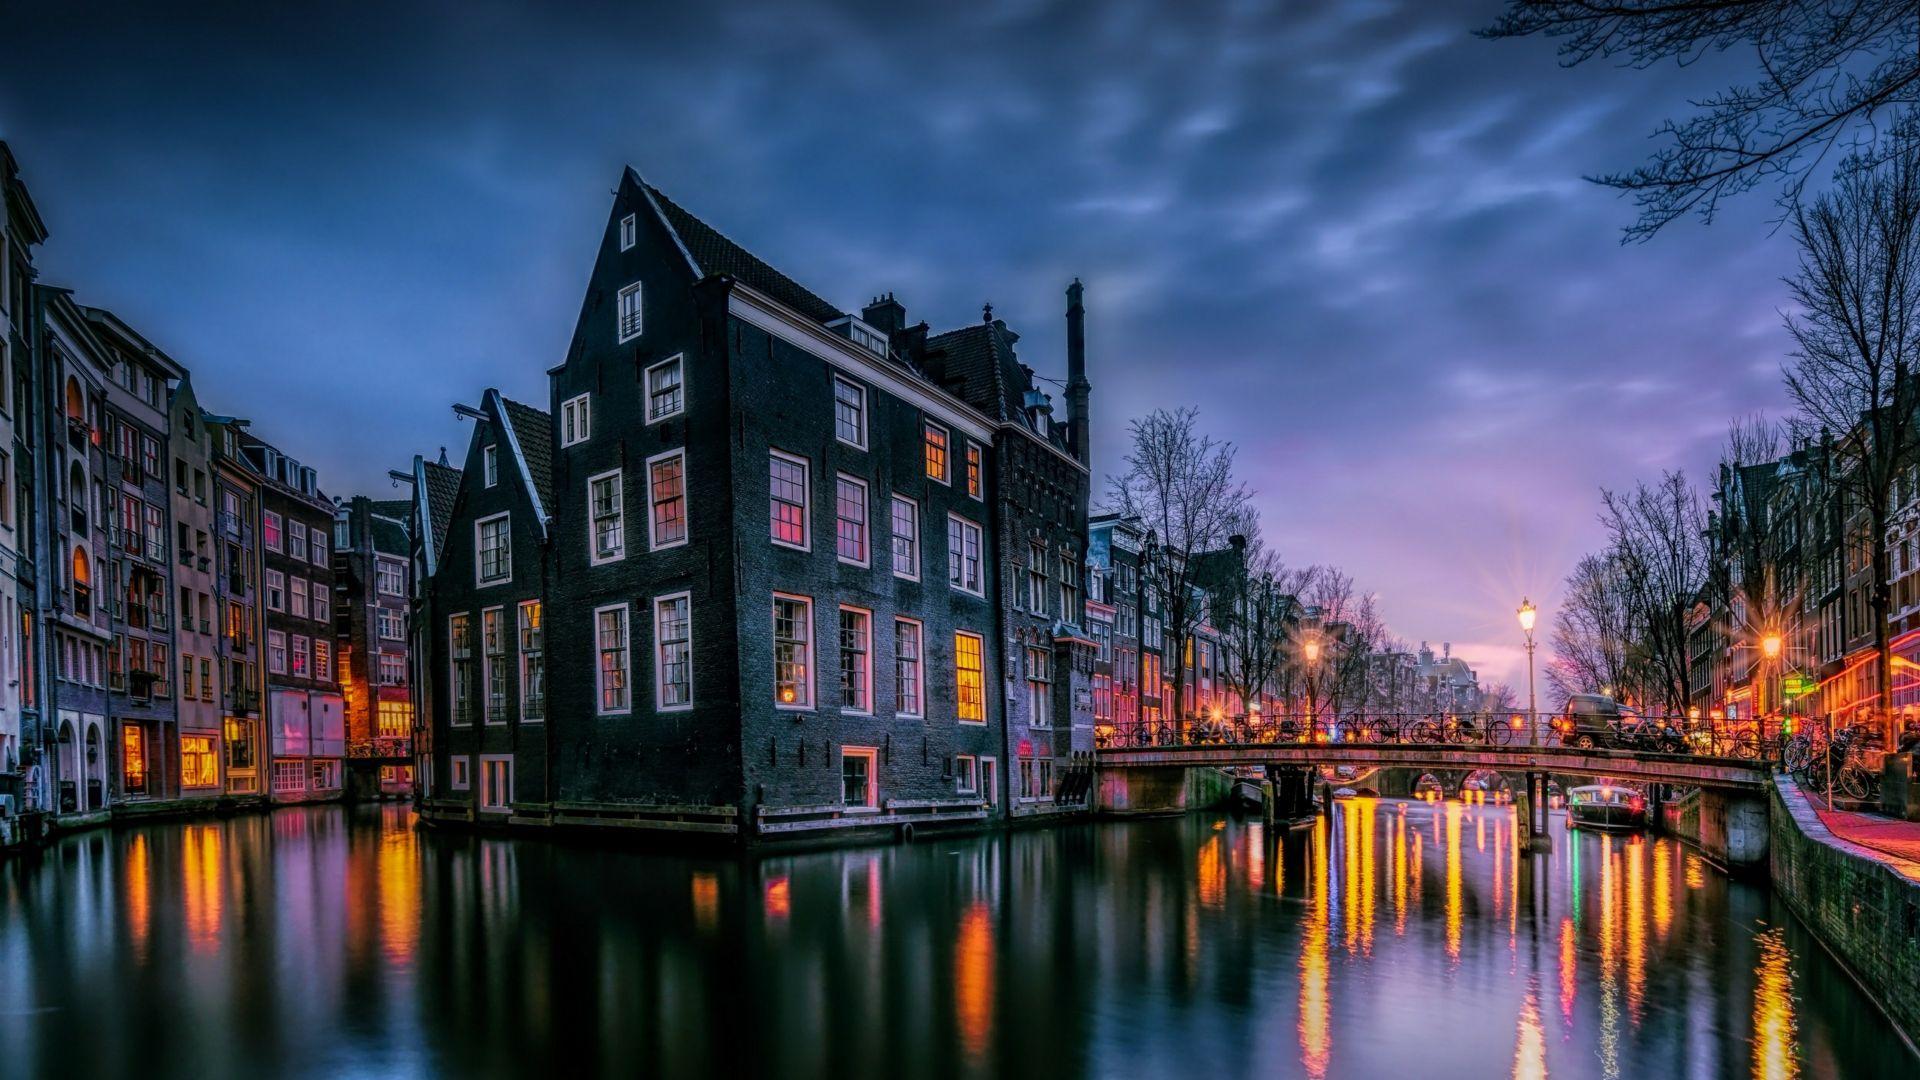 Wallpaper Amsterdam, Channel, 4K, Architecture #18504